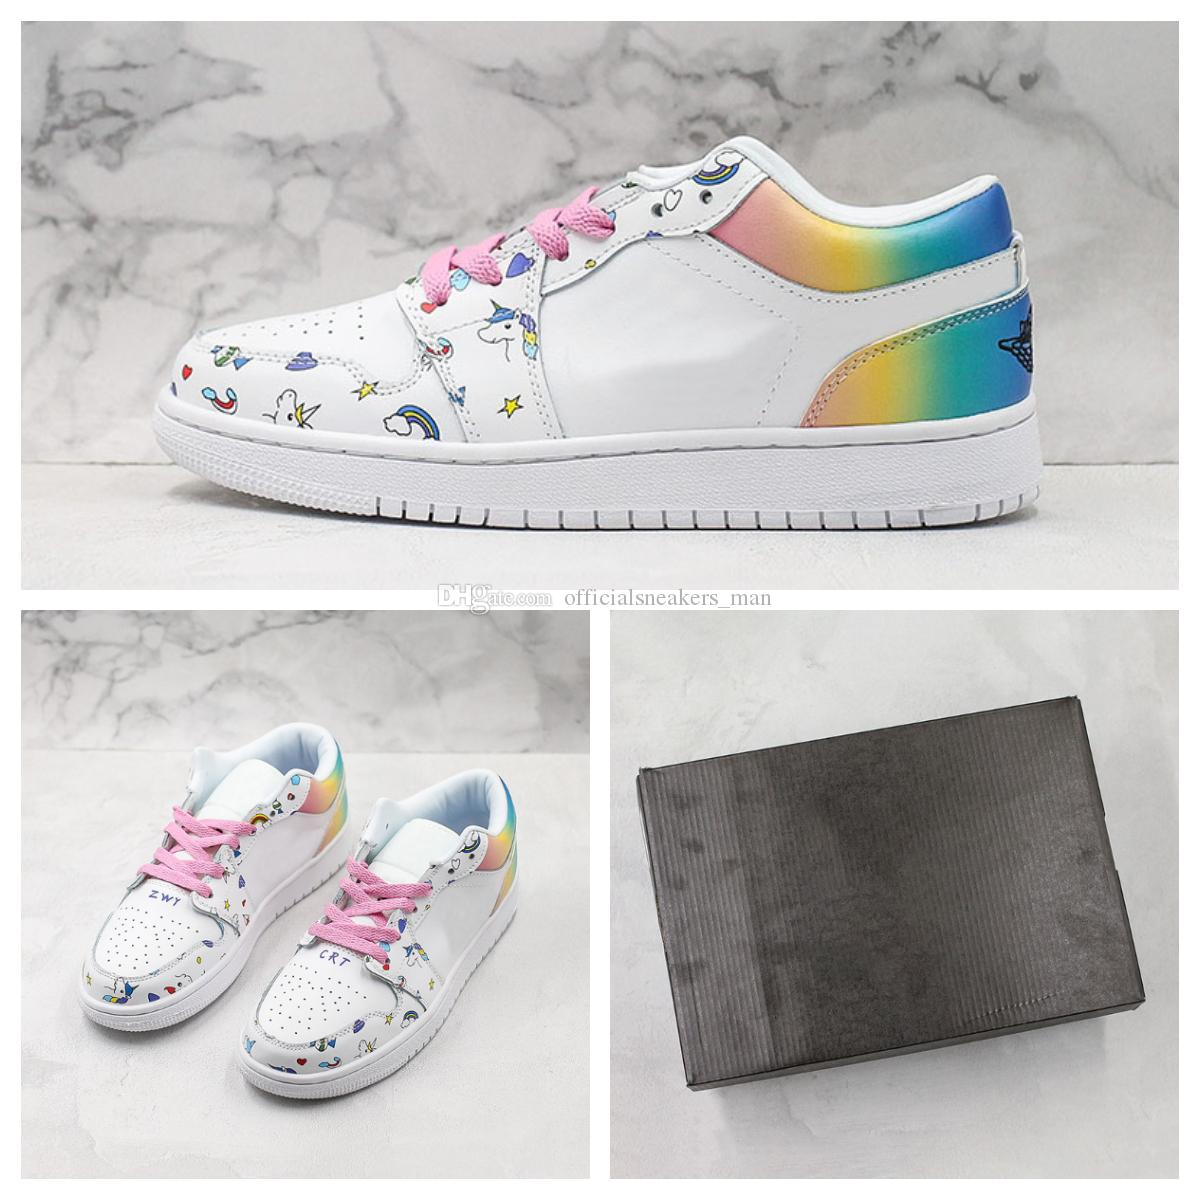 Custom Unicorn 1s Low Basketball Shoes